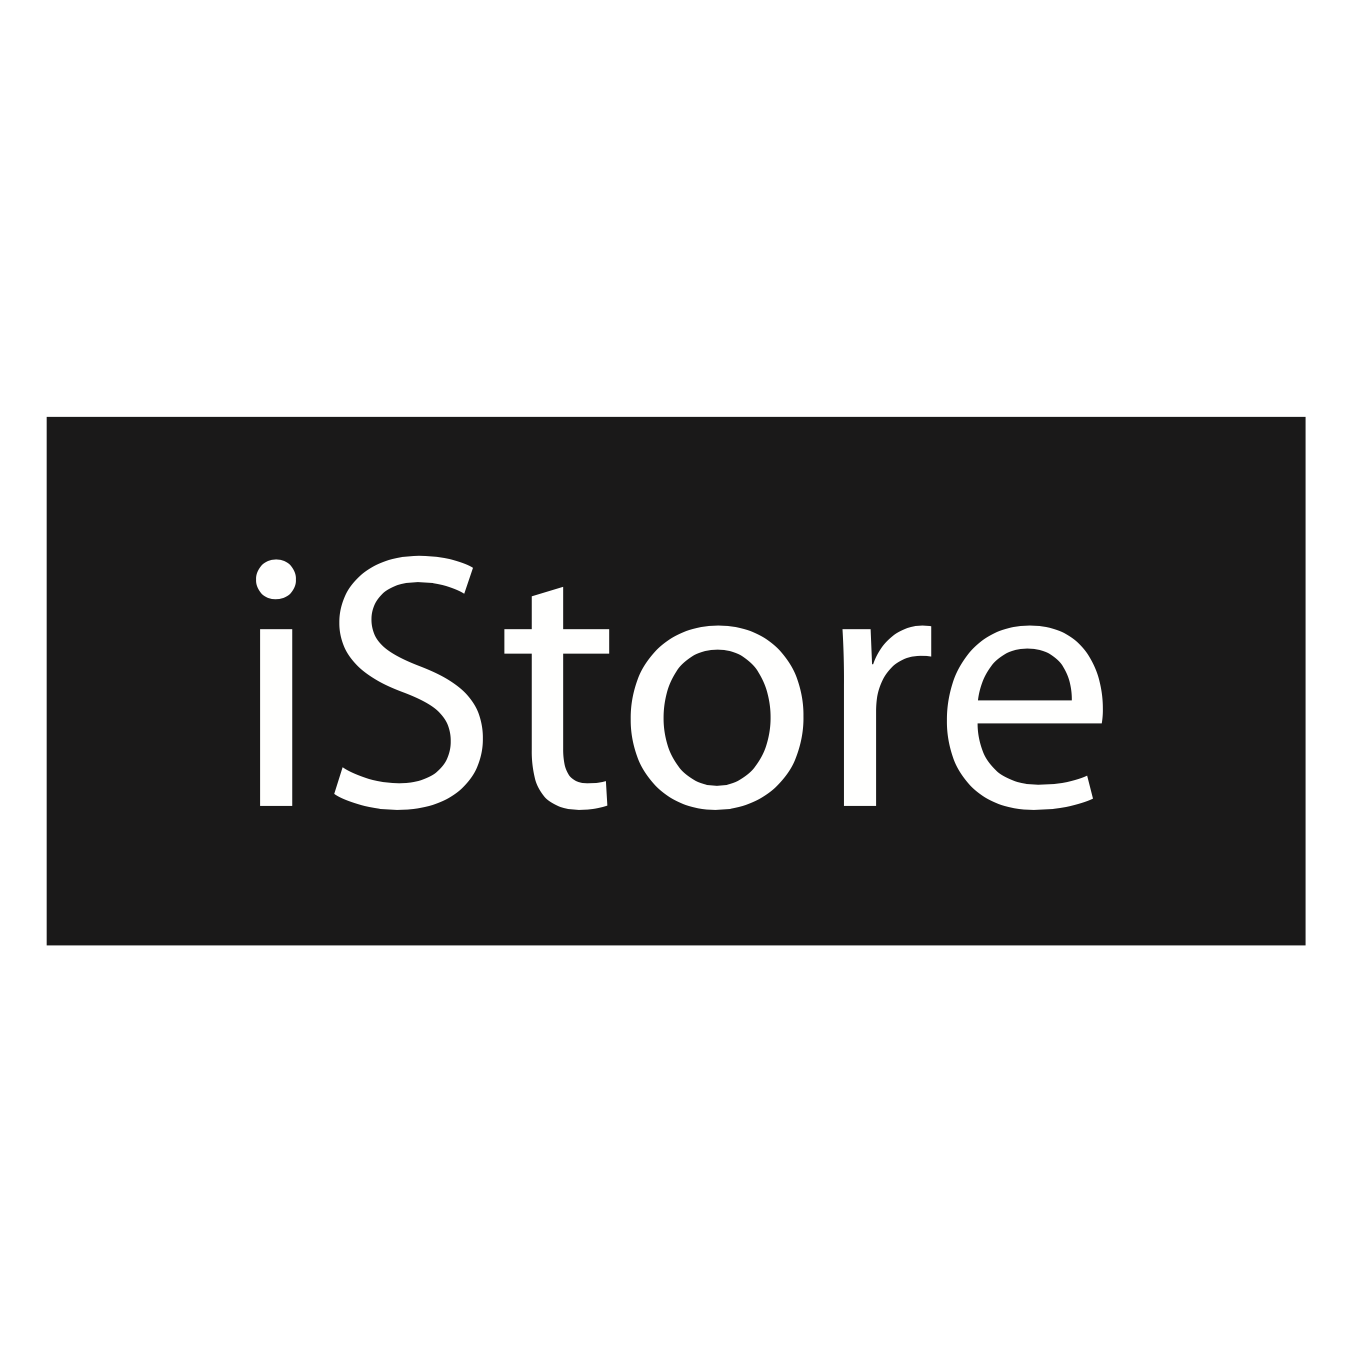 iPhone Xs Max Silicone Case - Blue Horizon